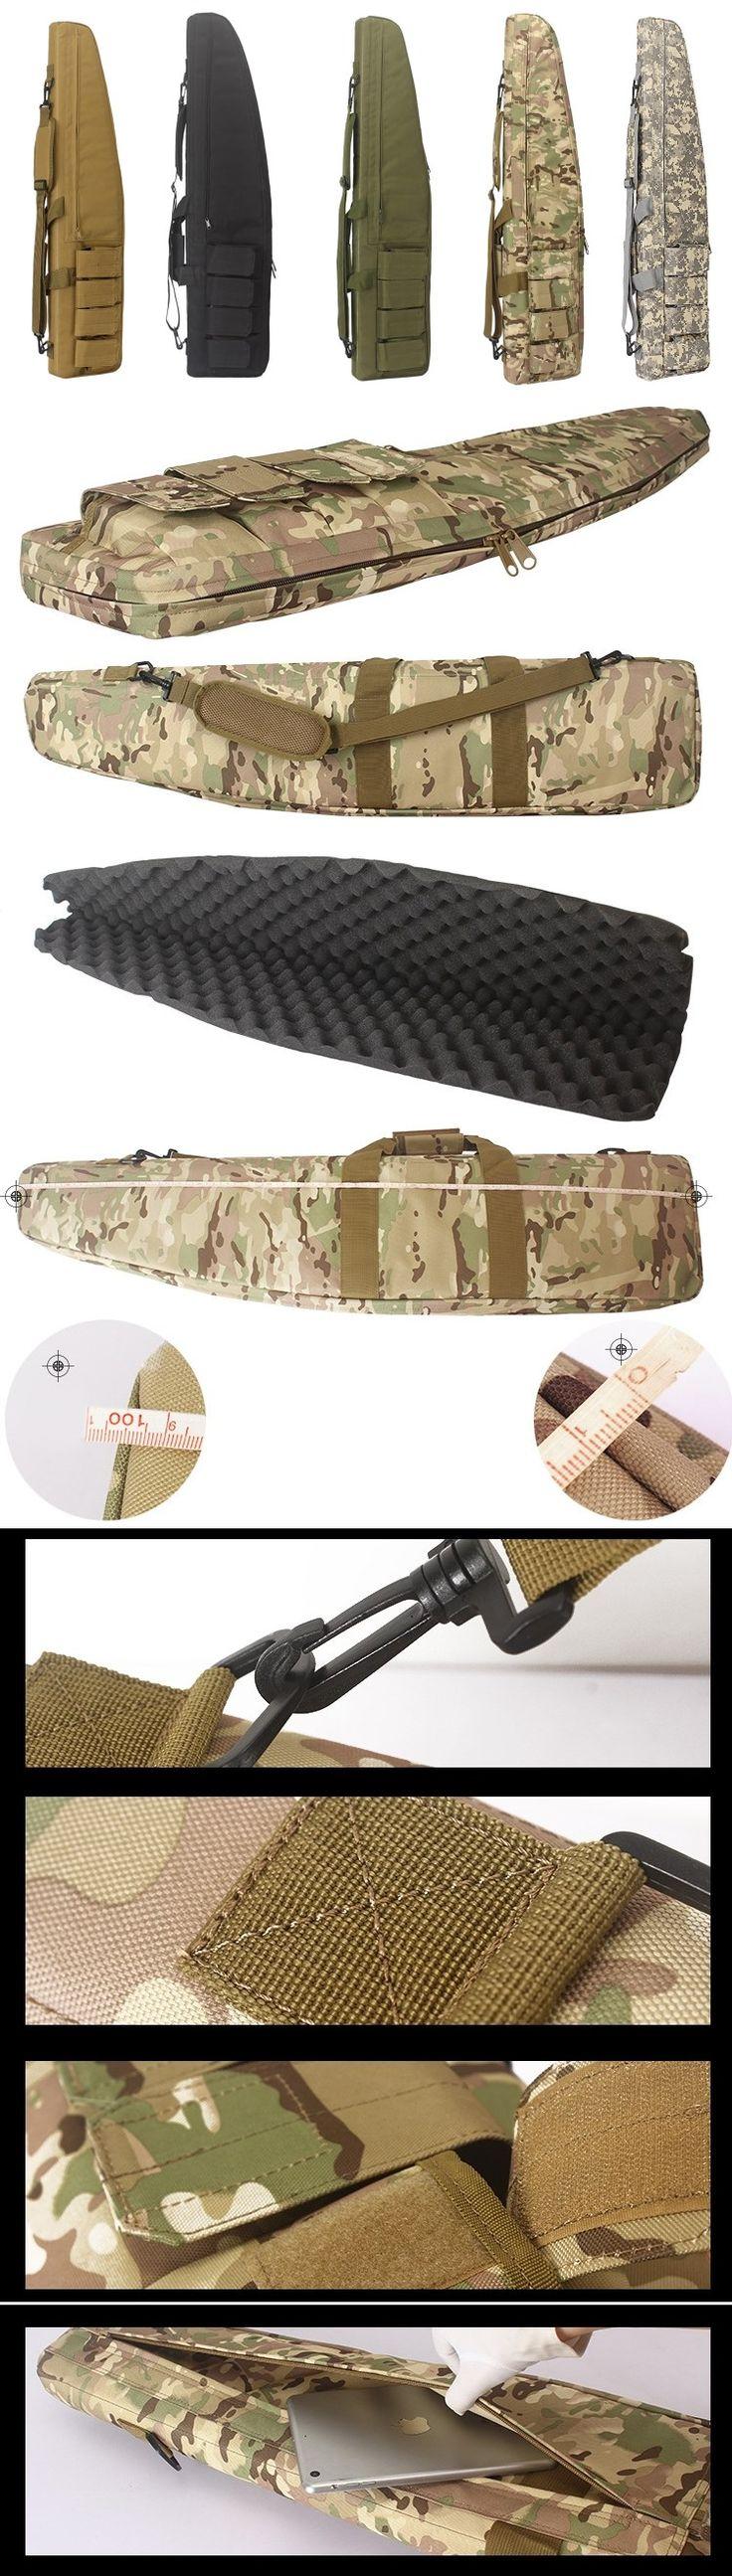 camouflage Military tactical gun rifle drag bag for AR15 AK47 WG6003Z